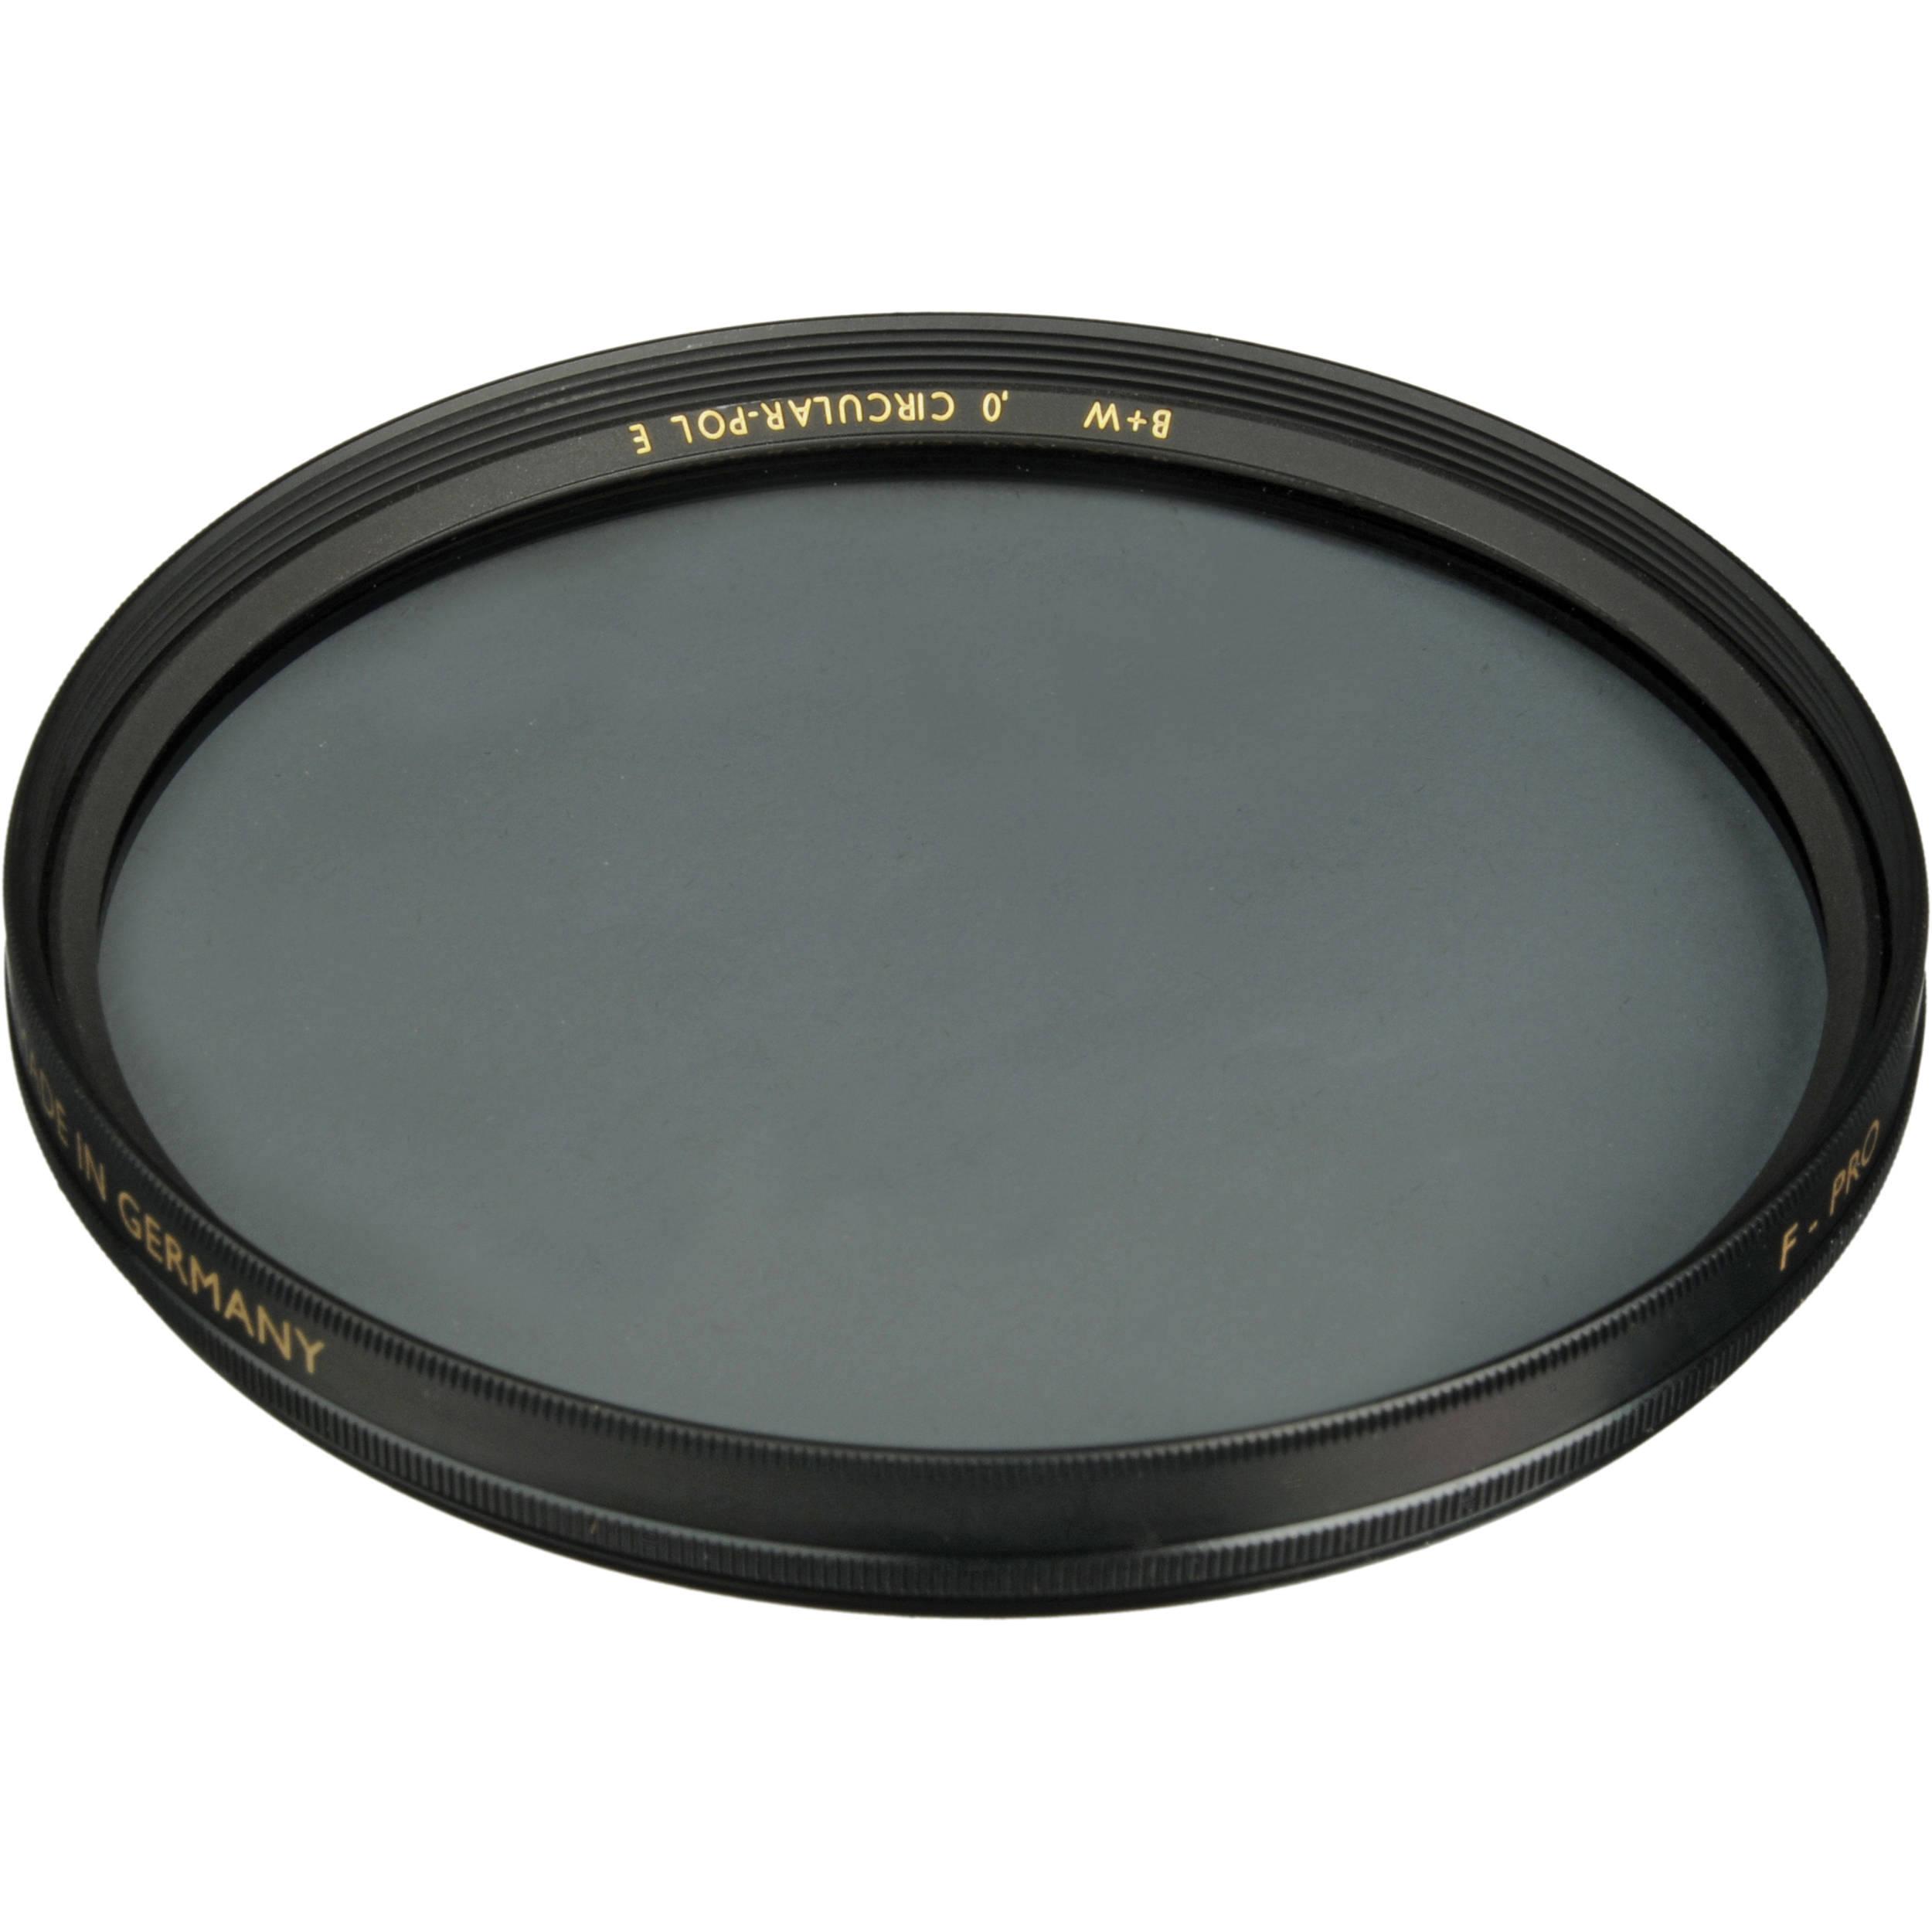 B+W 58mm Circular Polarizer with Single Coating